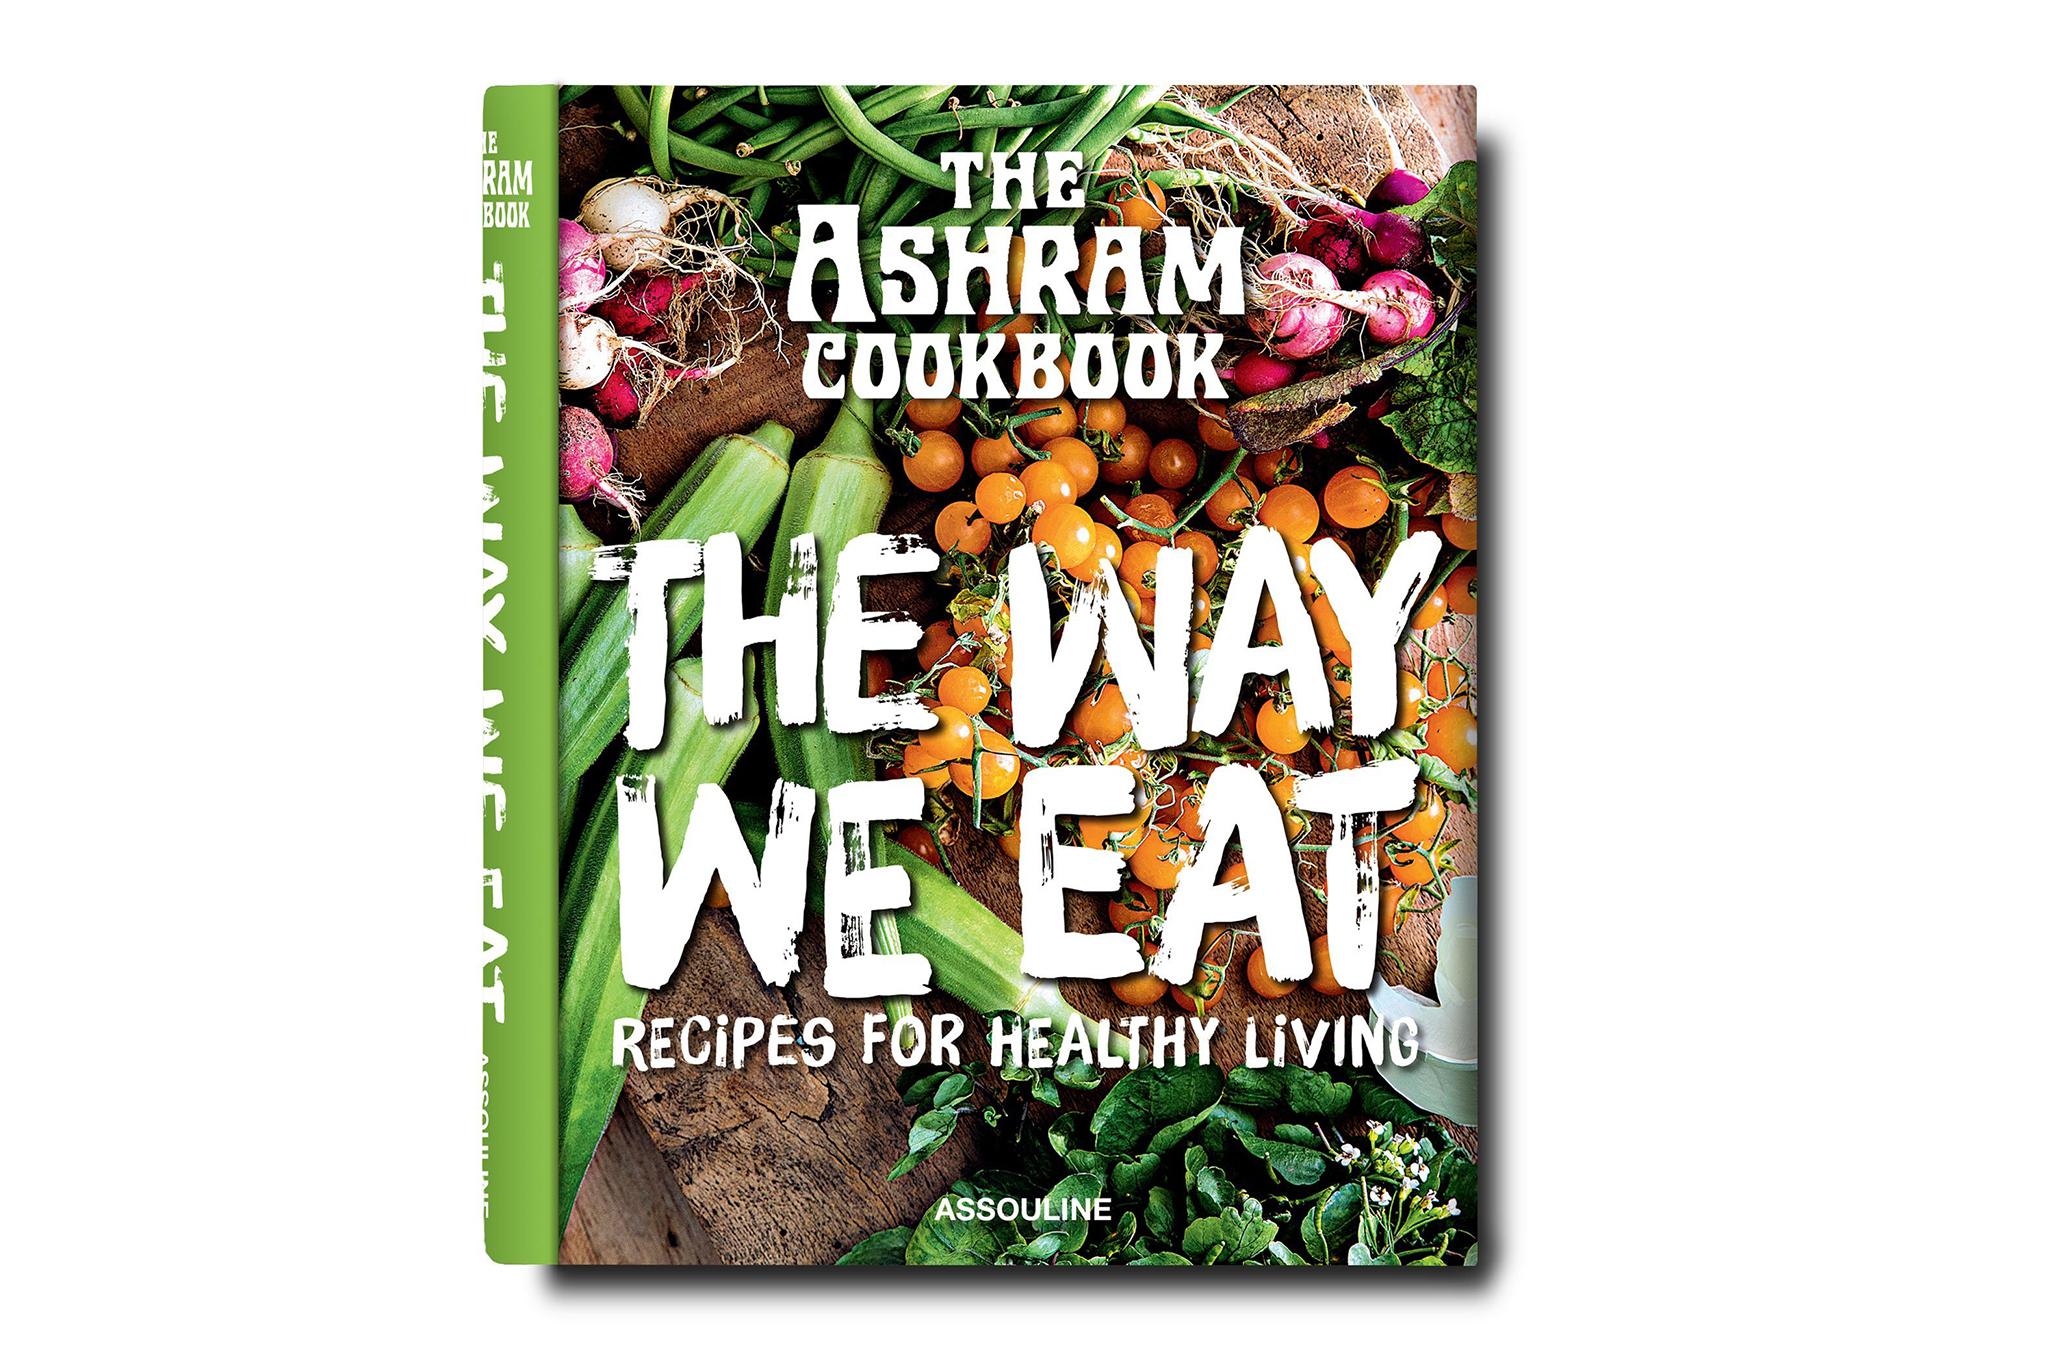 ASHRAMCOOKBOOK-Cover.jpg